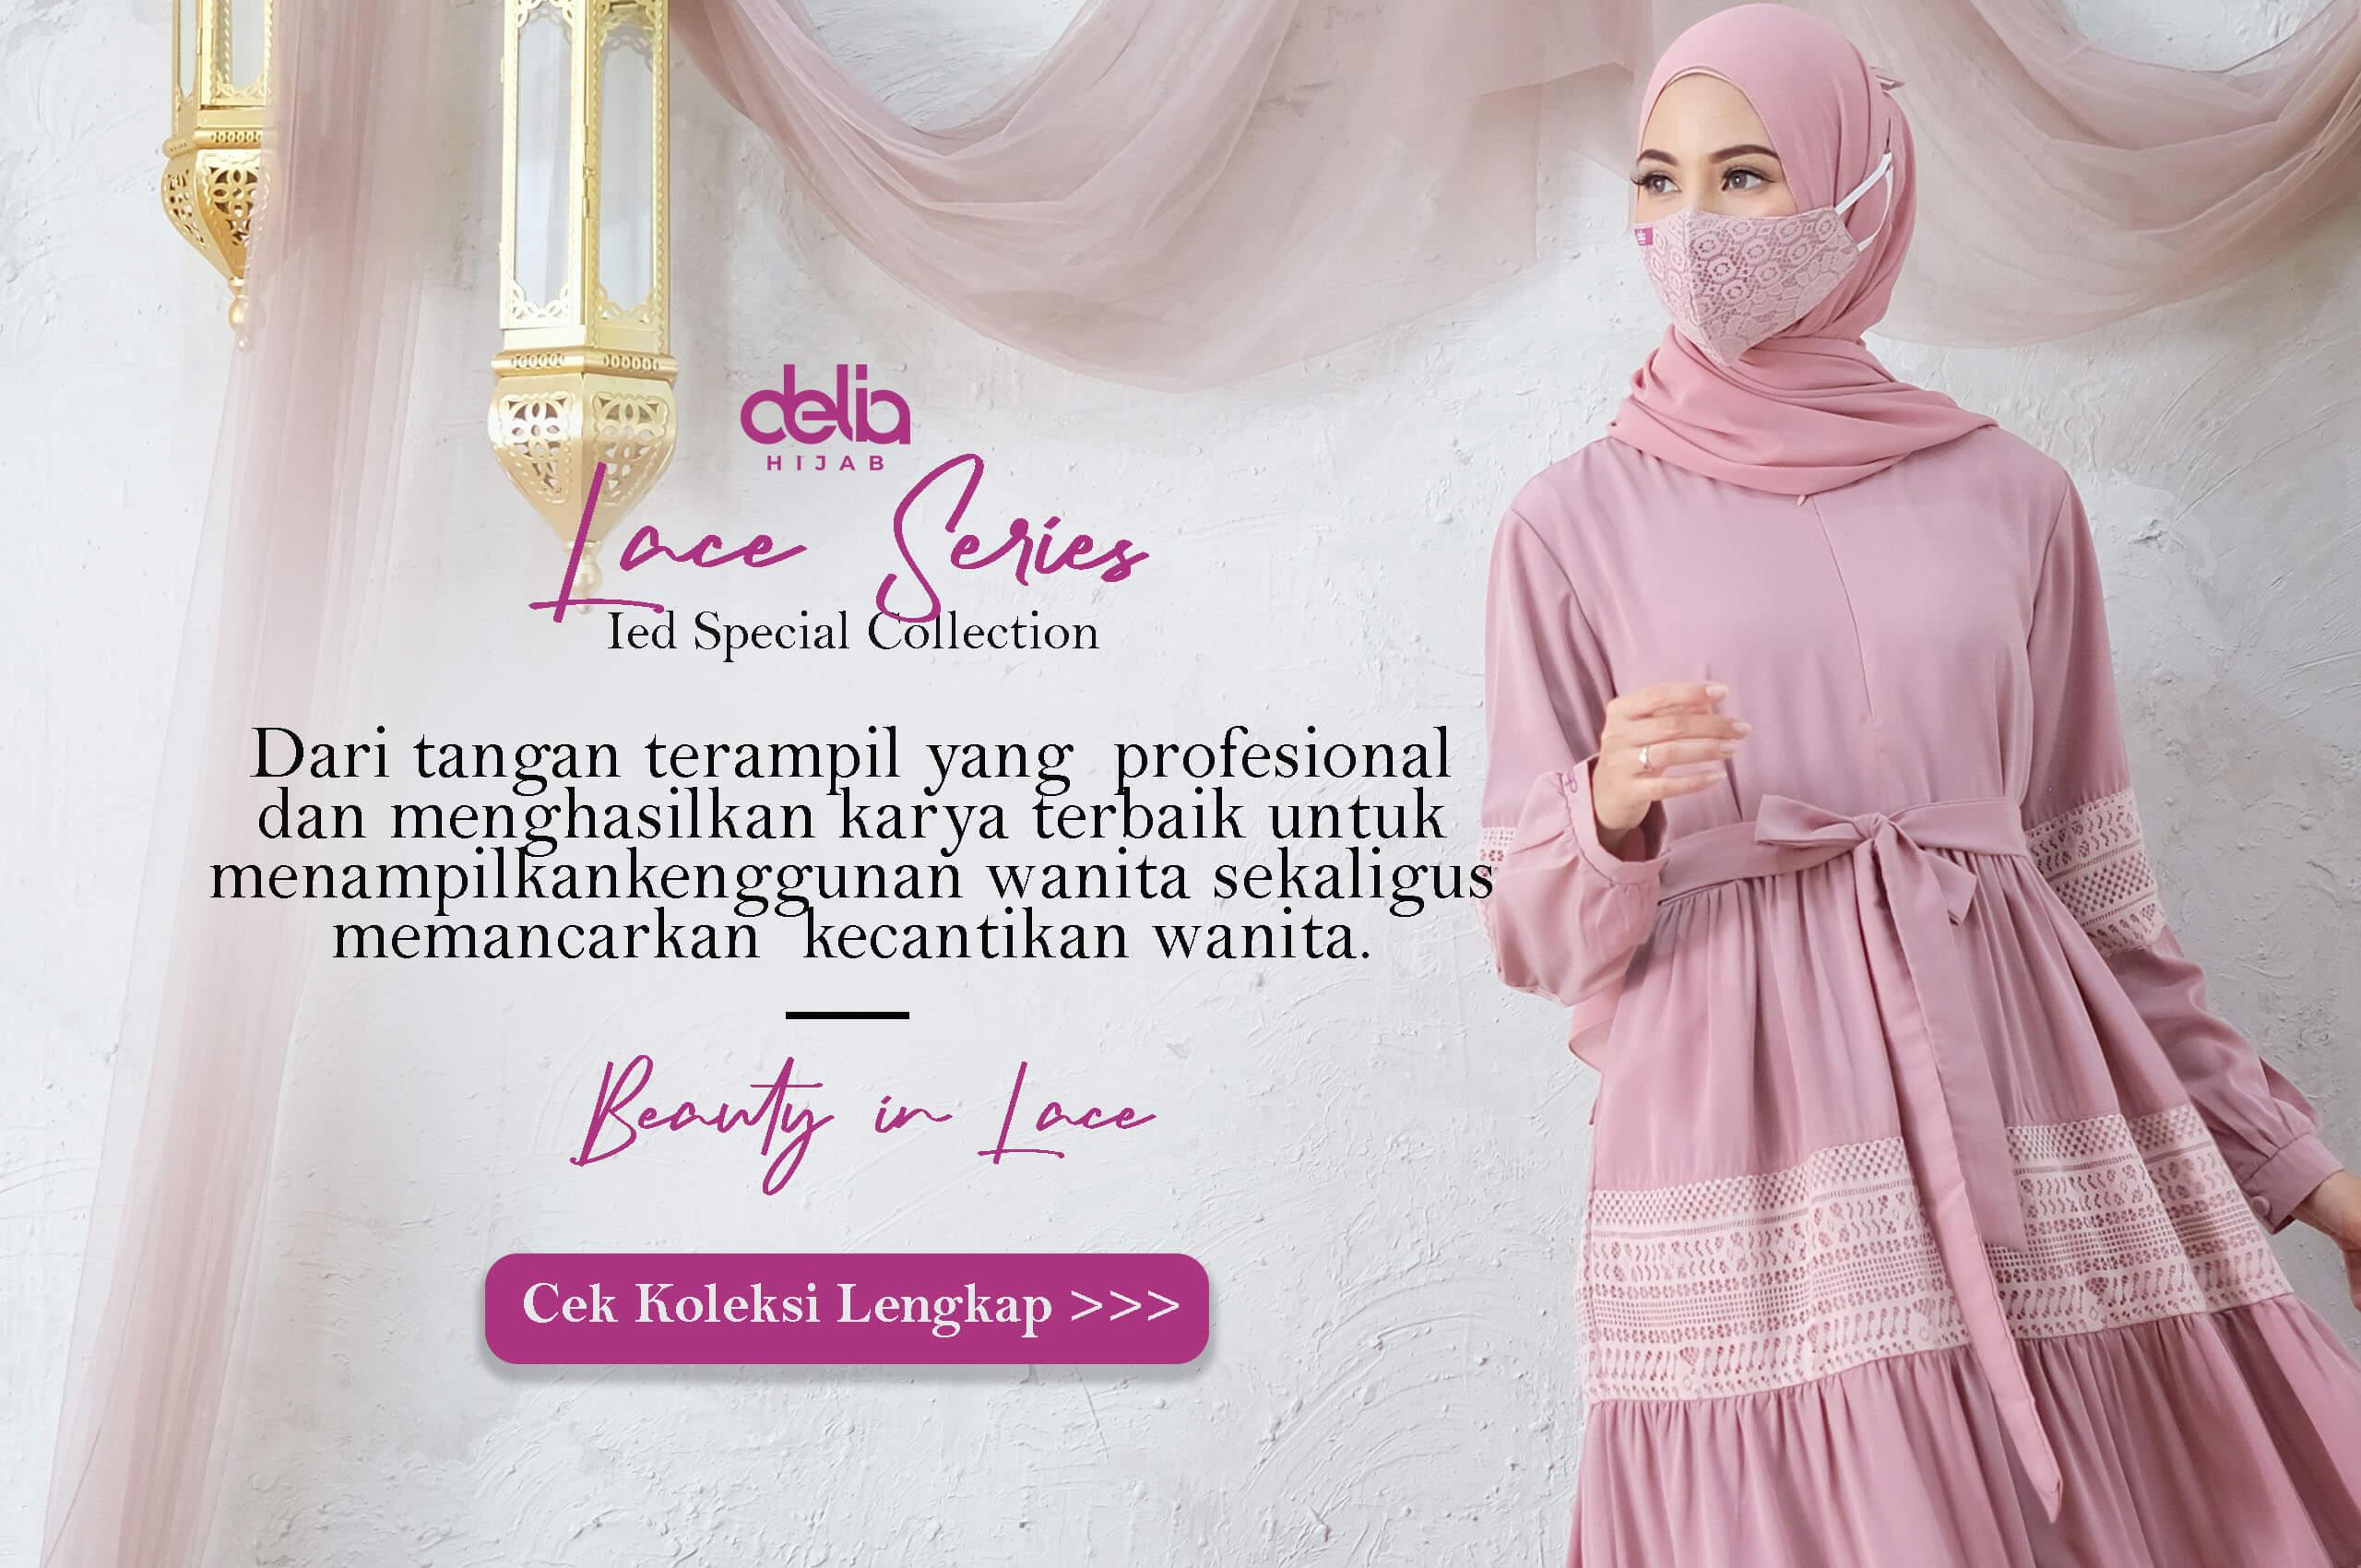 Delia Hijab Sukabumi - Beauty in Laces - Baju Muslim Ramadhan dan Lebaran 2021 1442 H